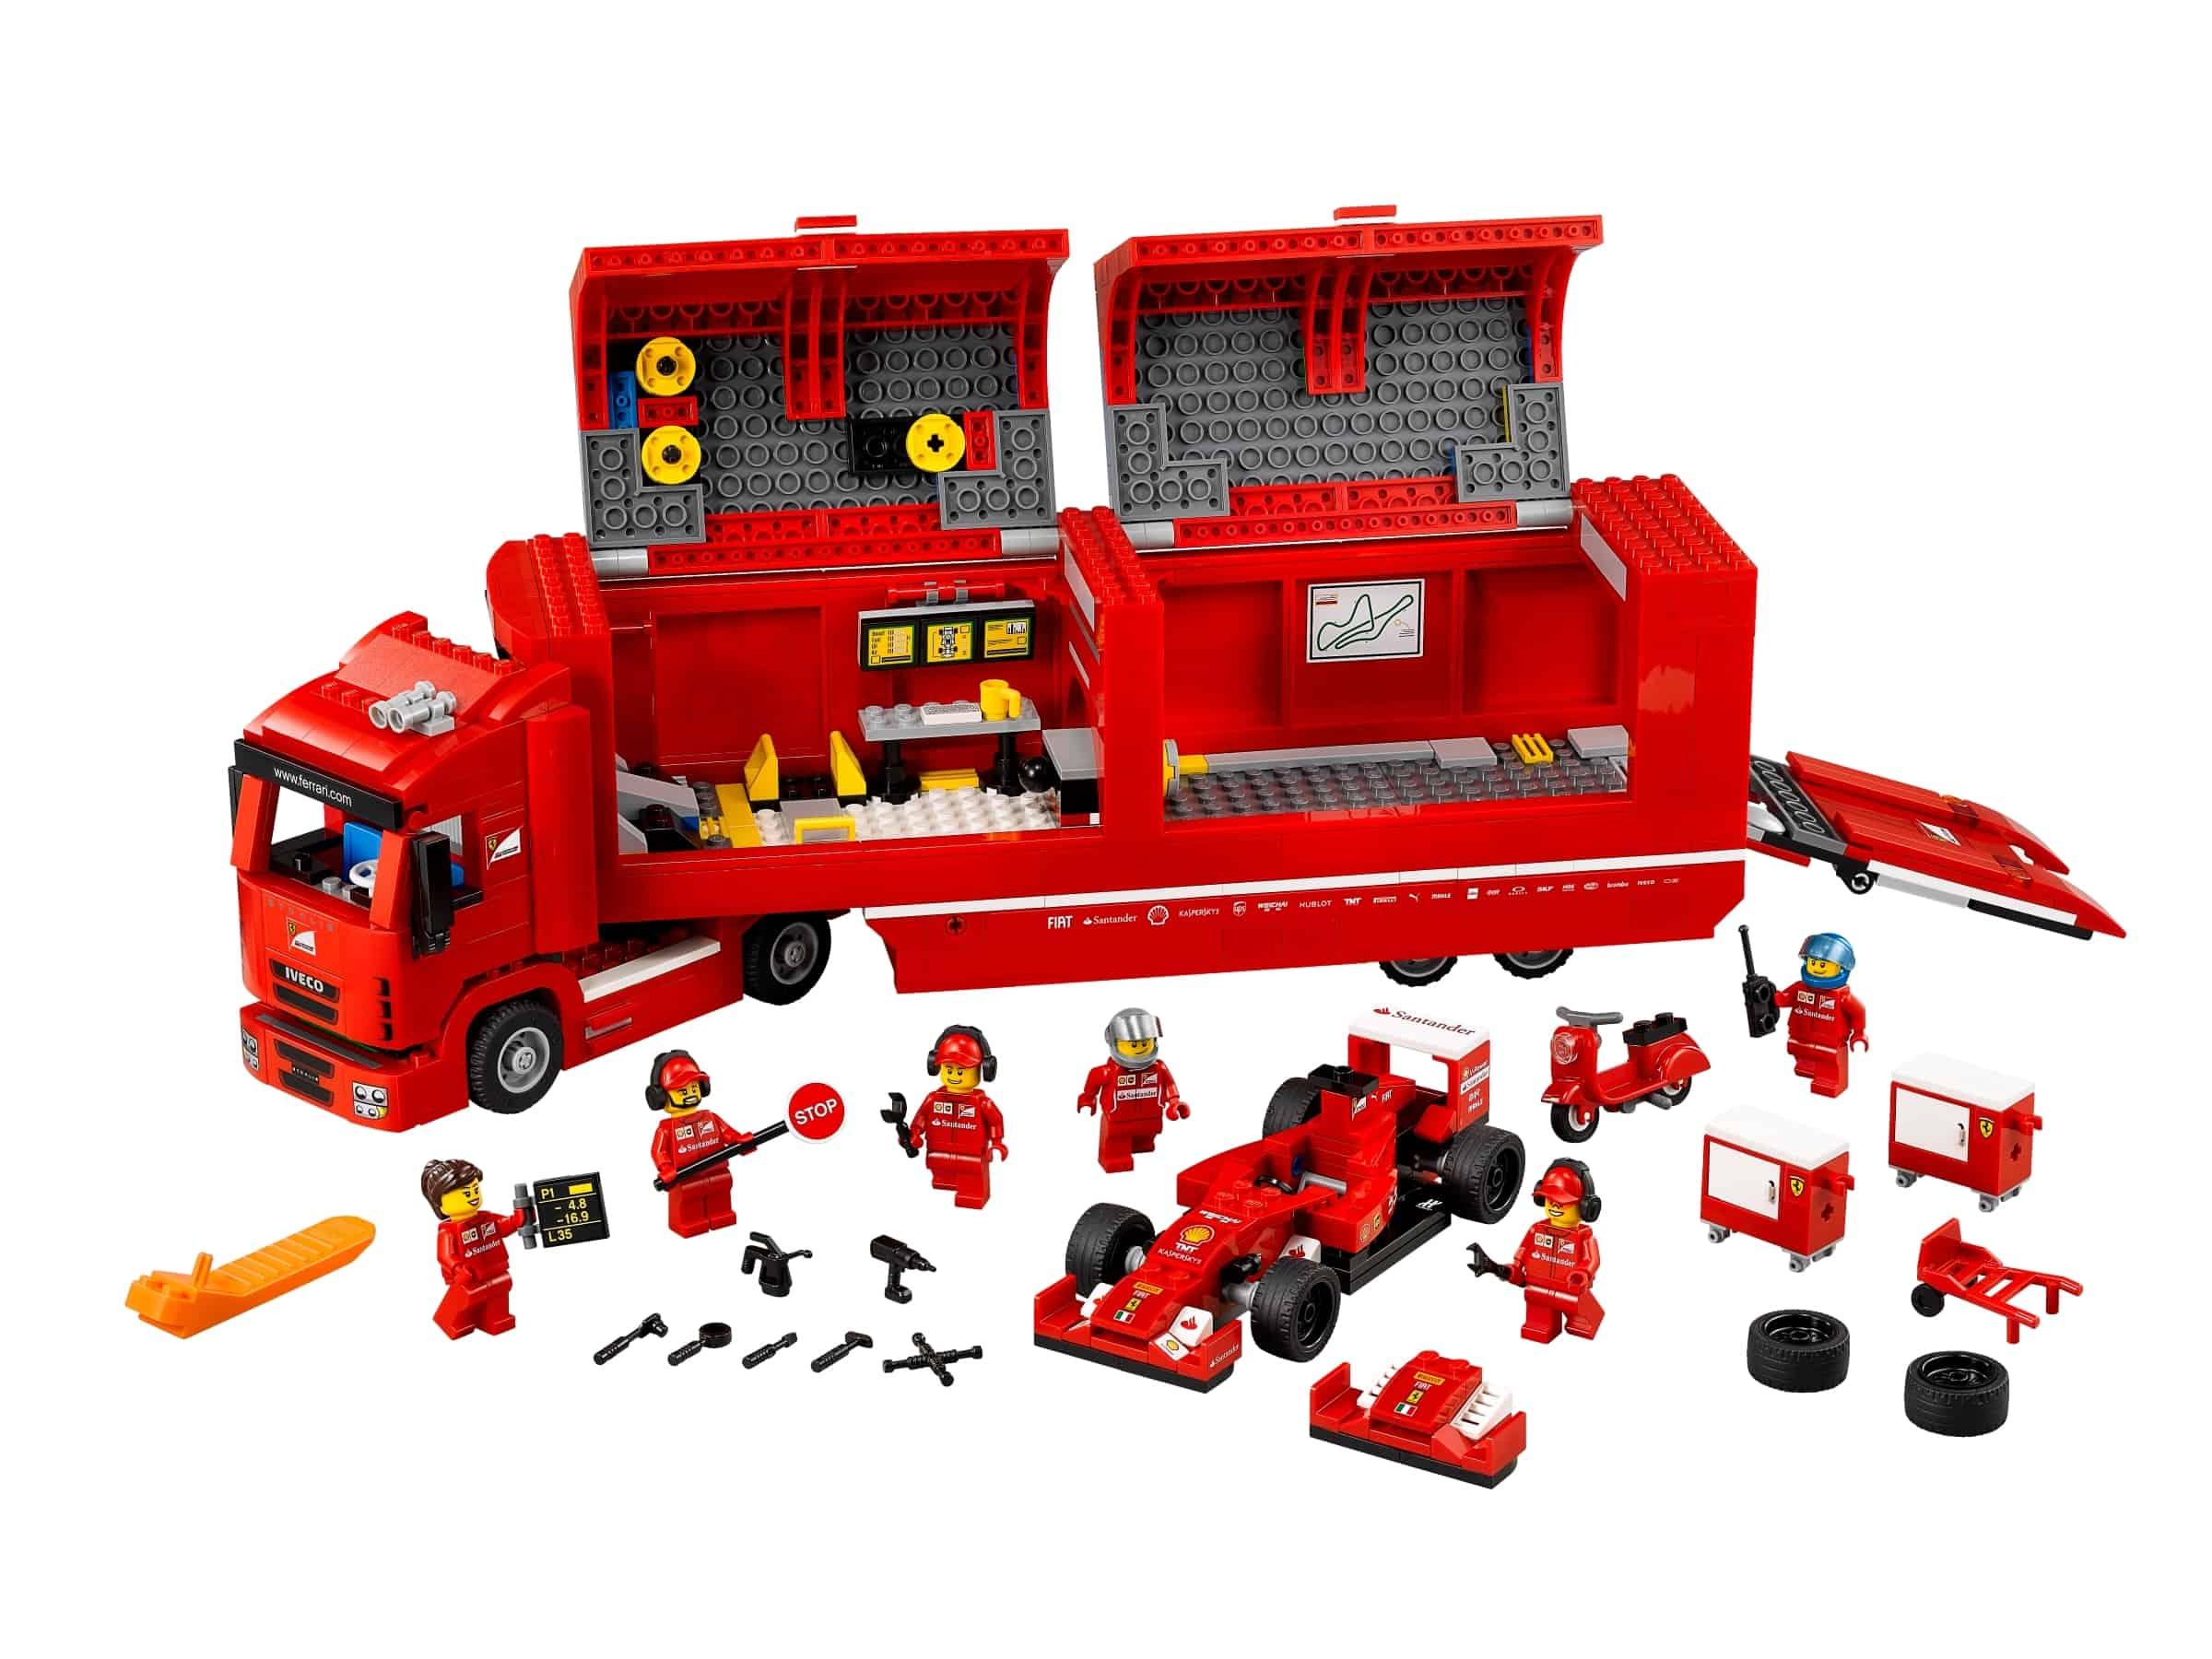 lego f14 t scuderia ferrari truck 75913